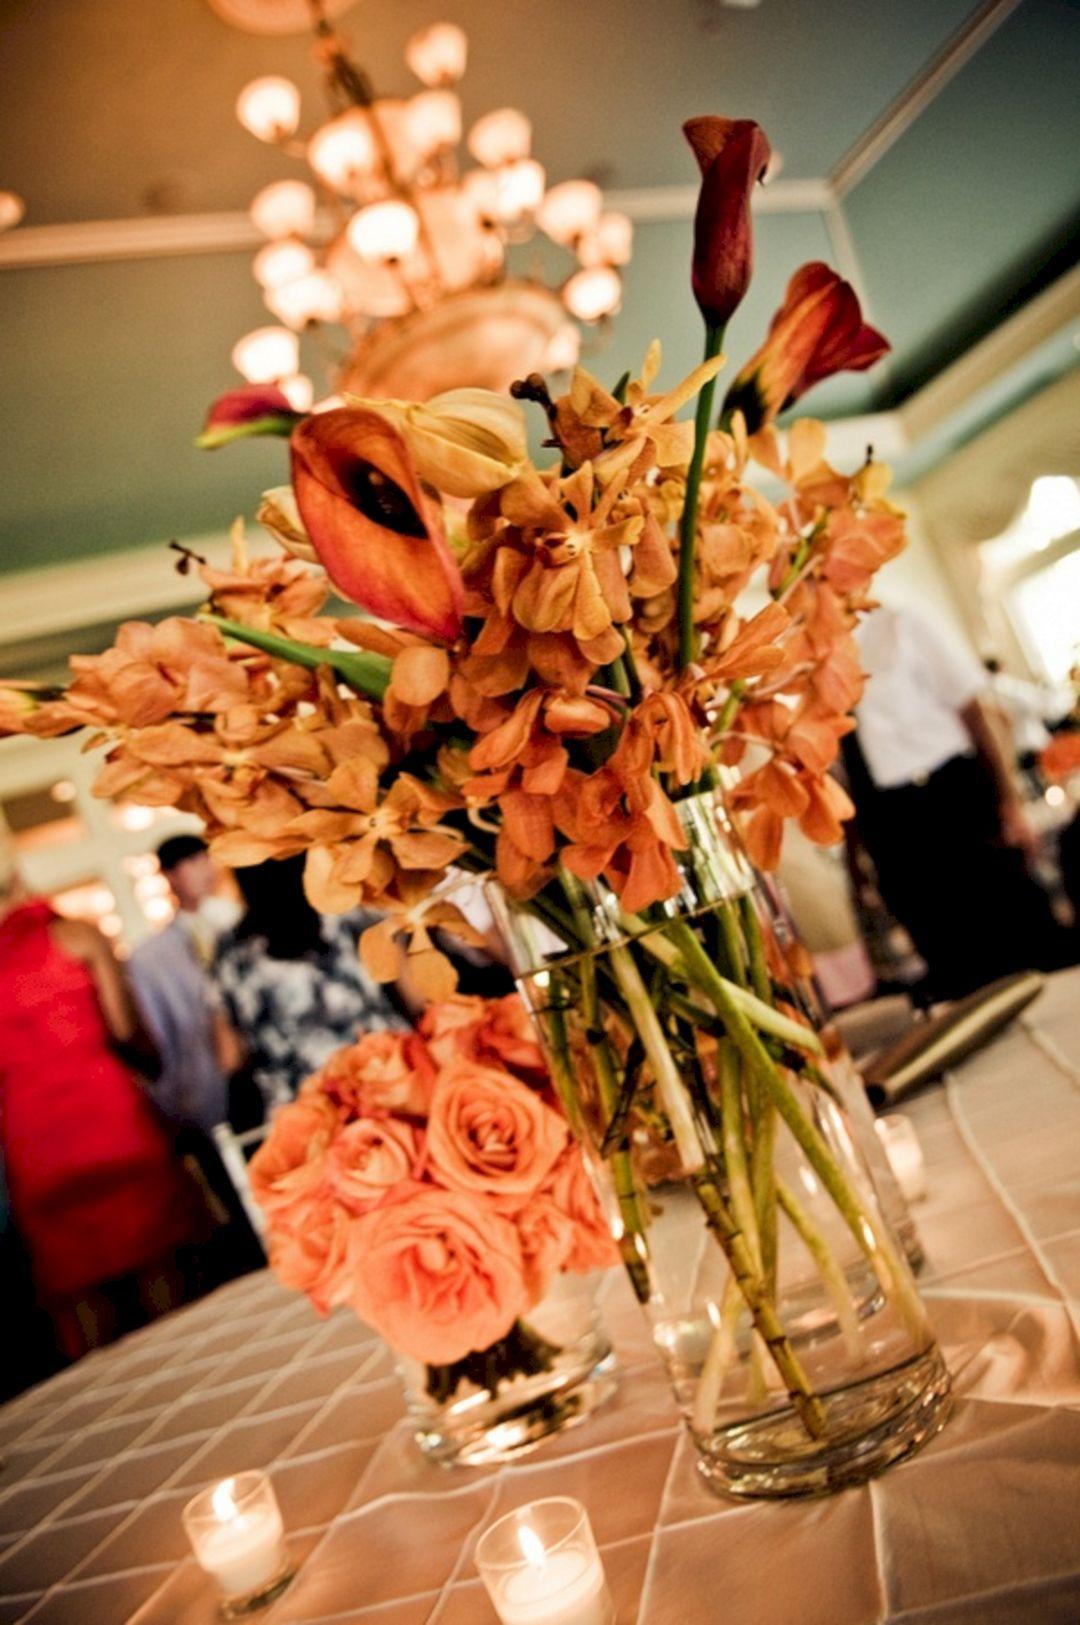 Wedding decoration ideas centerpieces   Incredible Centerpieces Ideas for Fall Weddings  Centerpieces